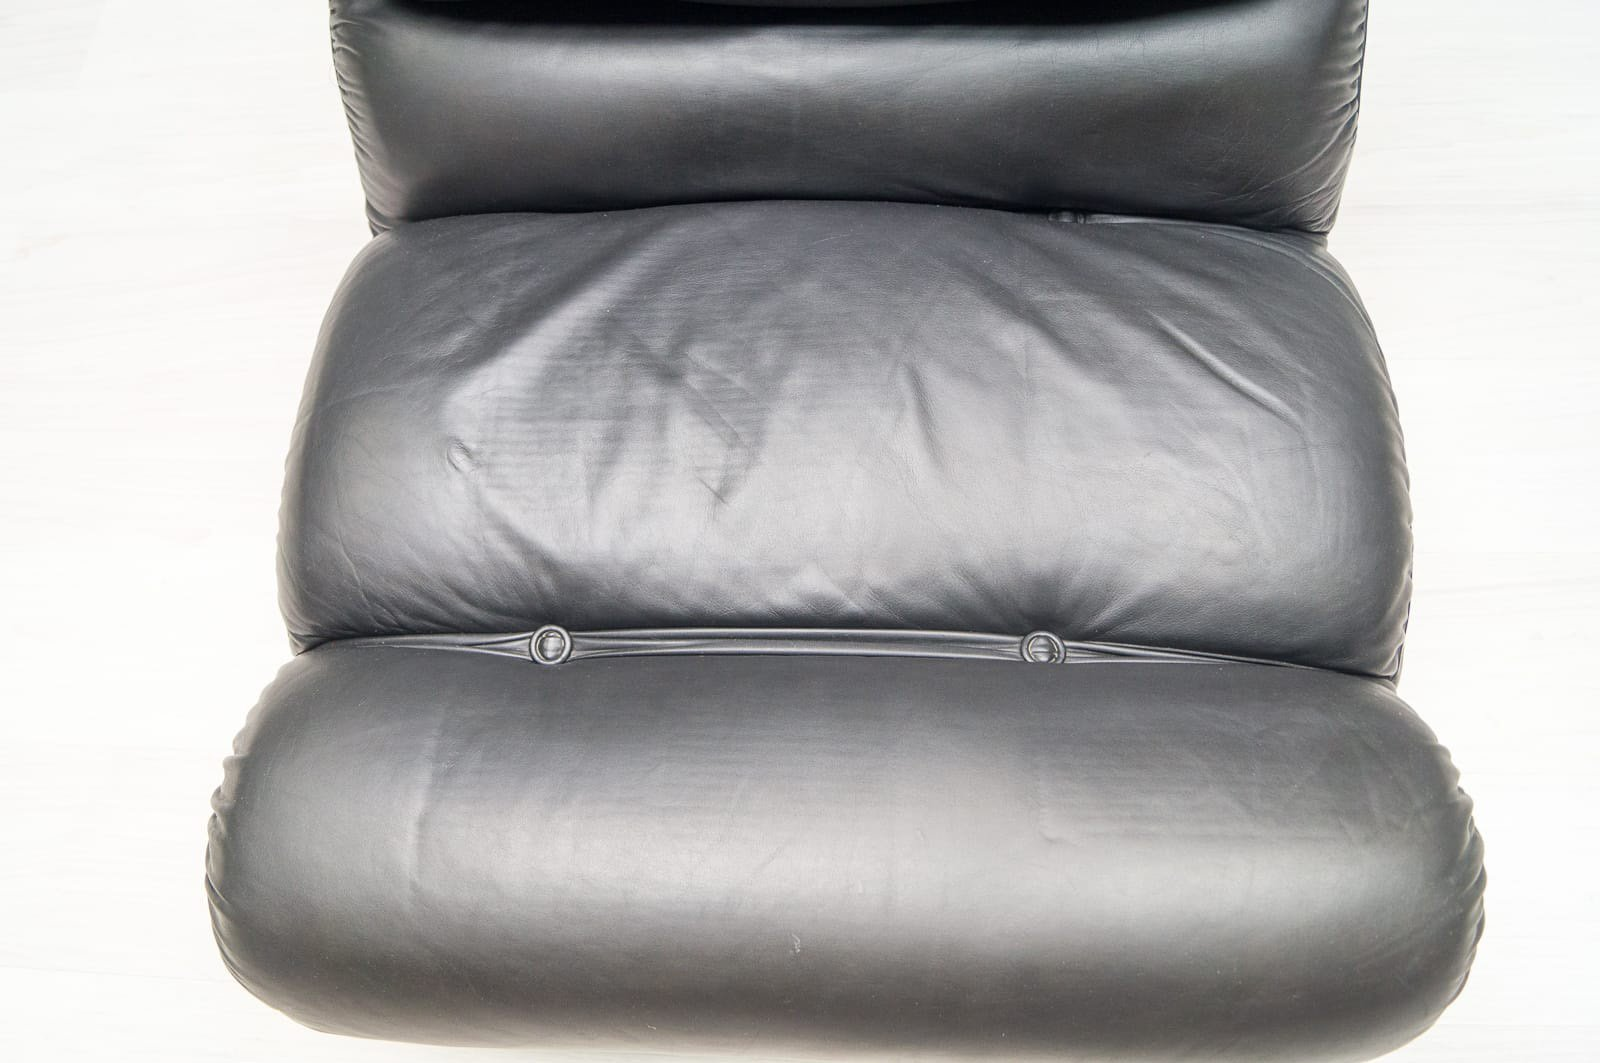 italienische orsola ledersessel von gastone rinaldi f r. Black Bedroom Furniture Sets. Home Design Ideas